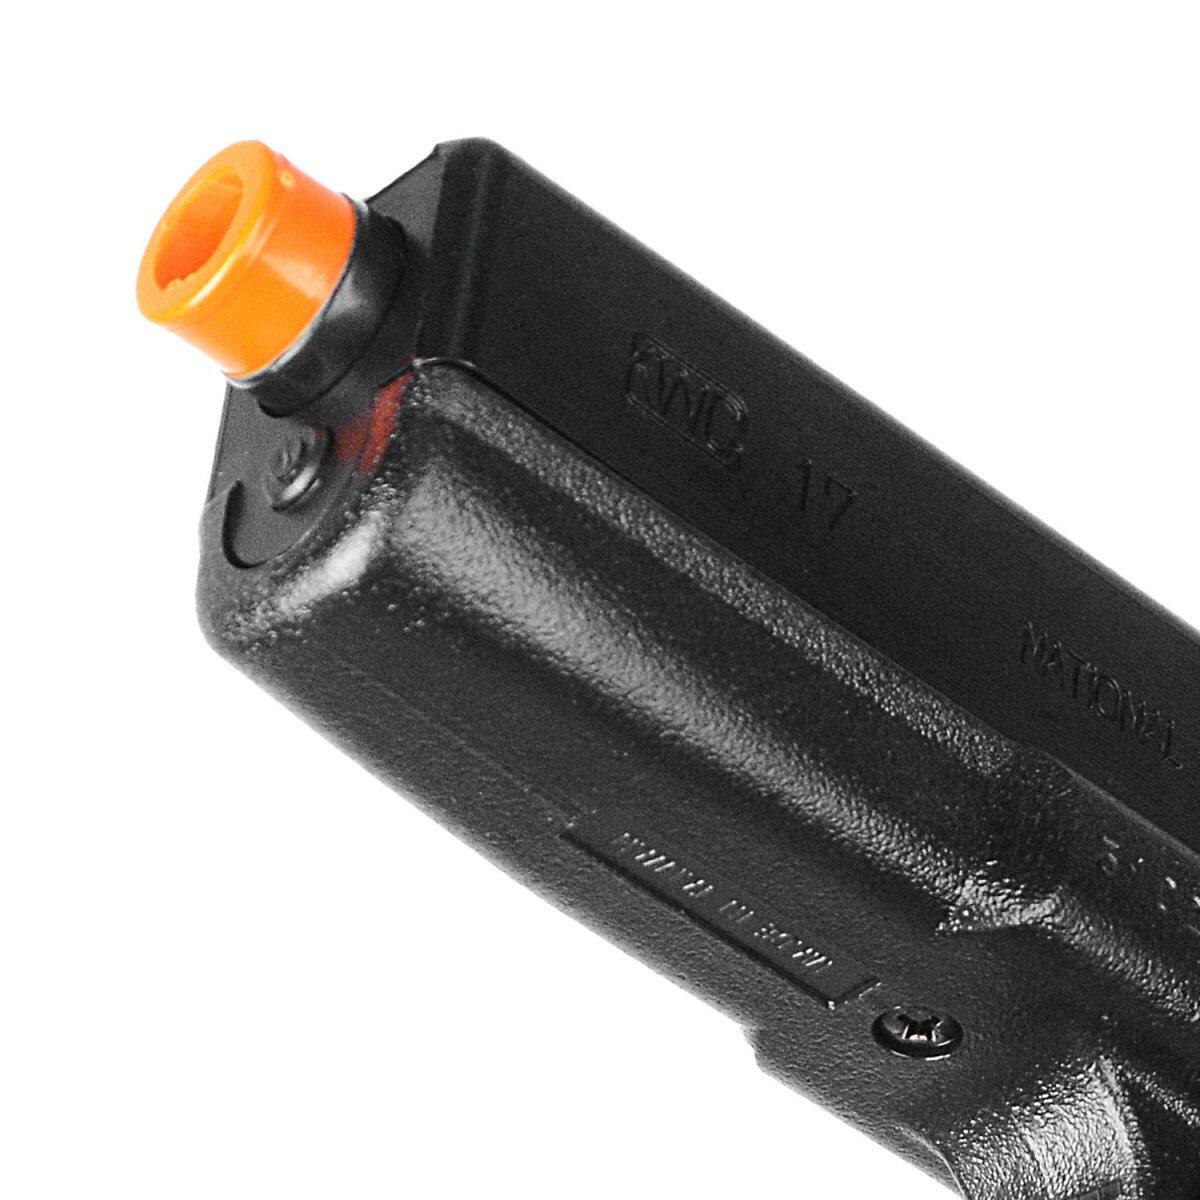 Pistola Airsoft 6Mm G7 Hp Spring Mola Actionx Kwc